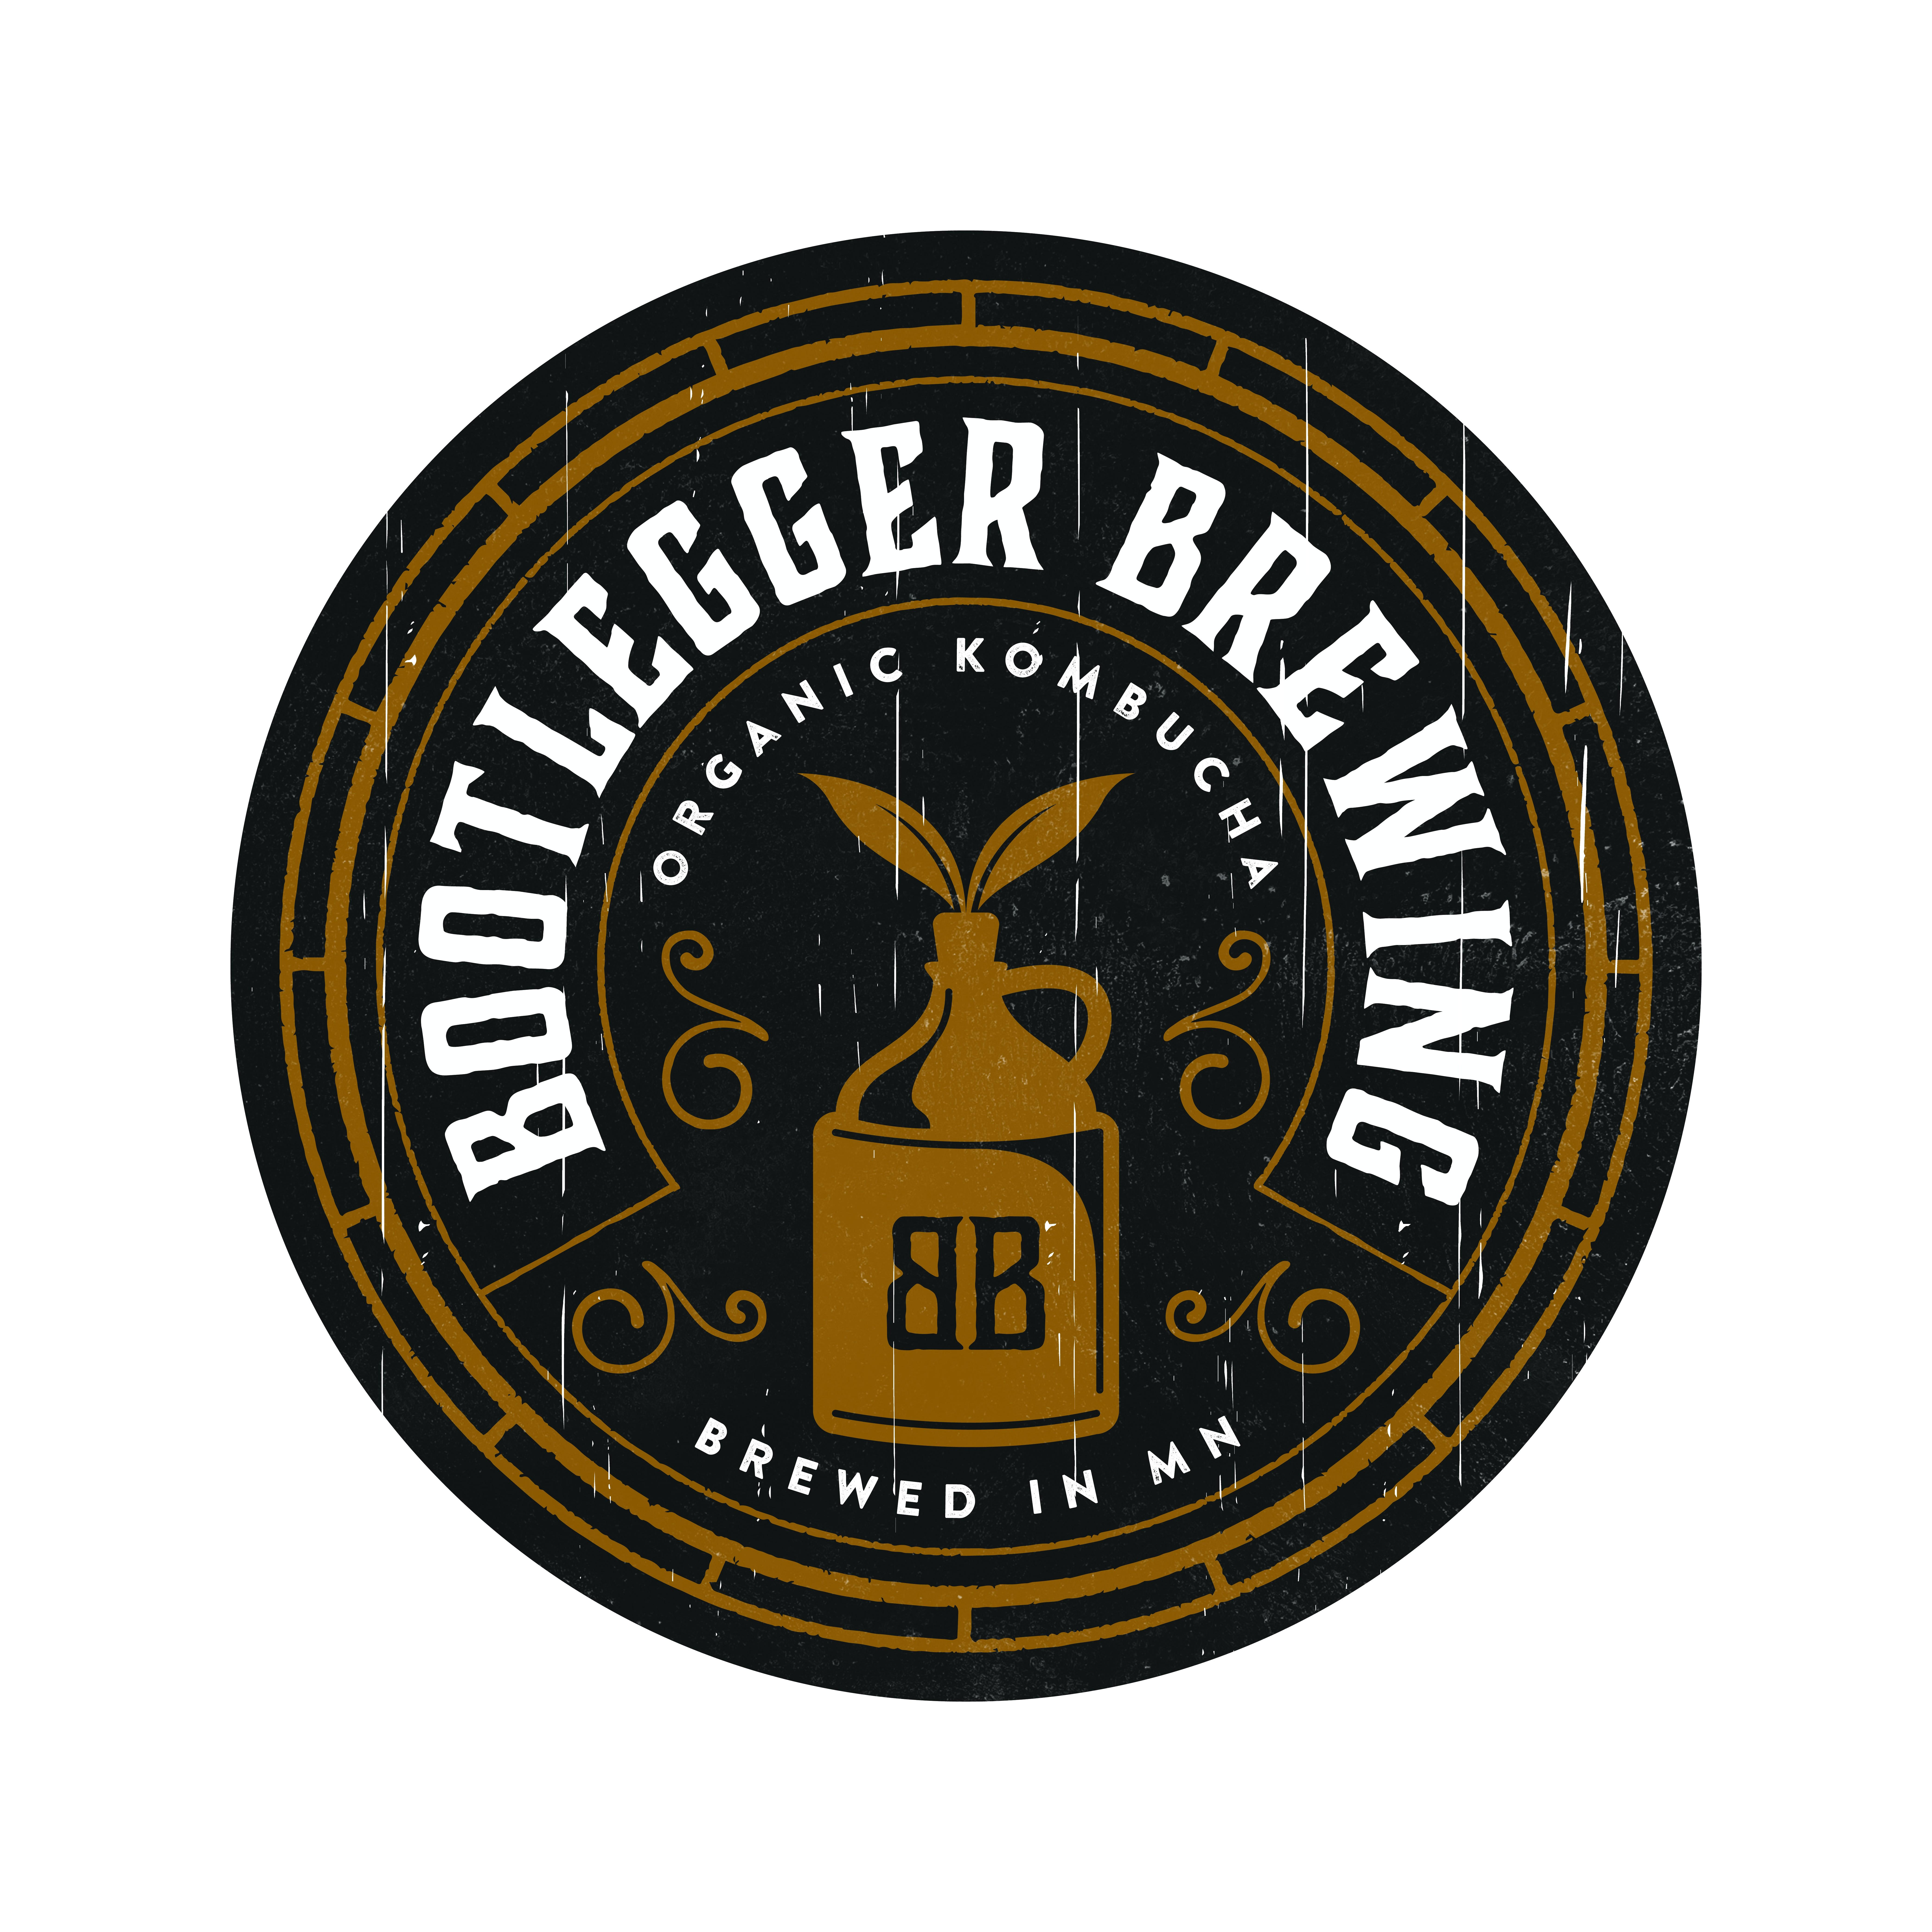 Bootlegger Brewing- Locally brewed Kombucha